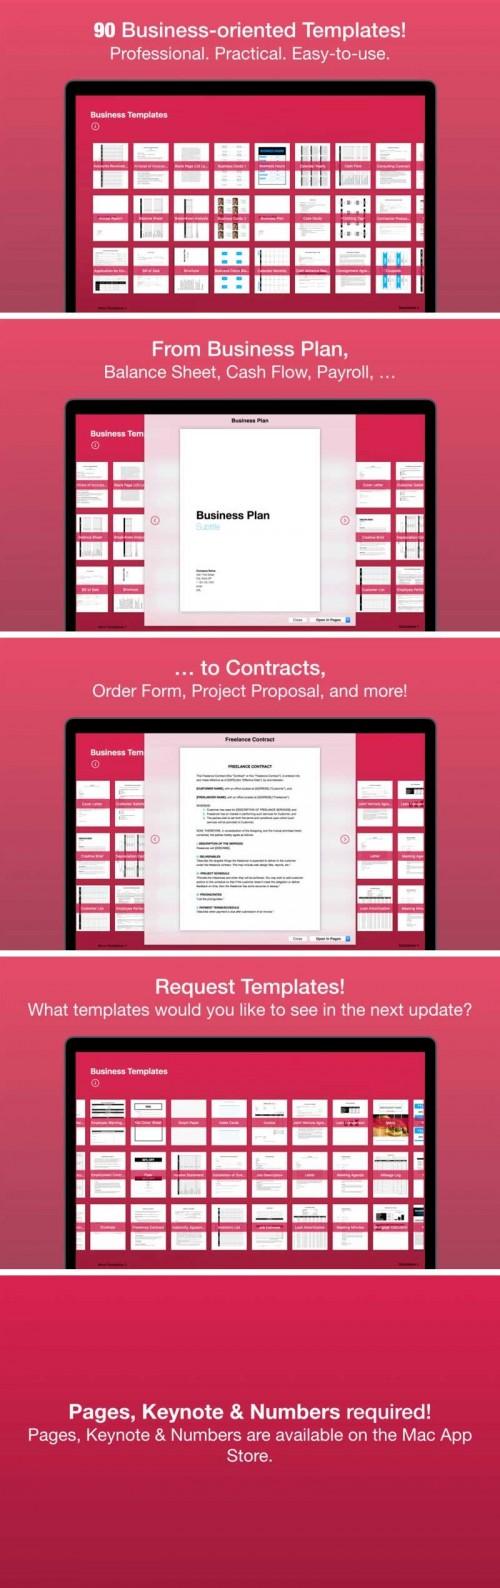 Business_Templates_Mac.jpg